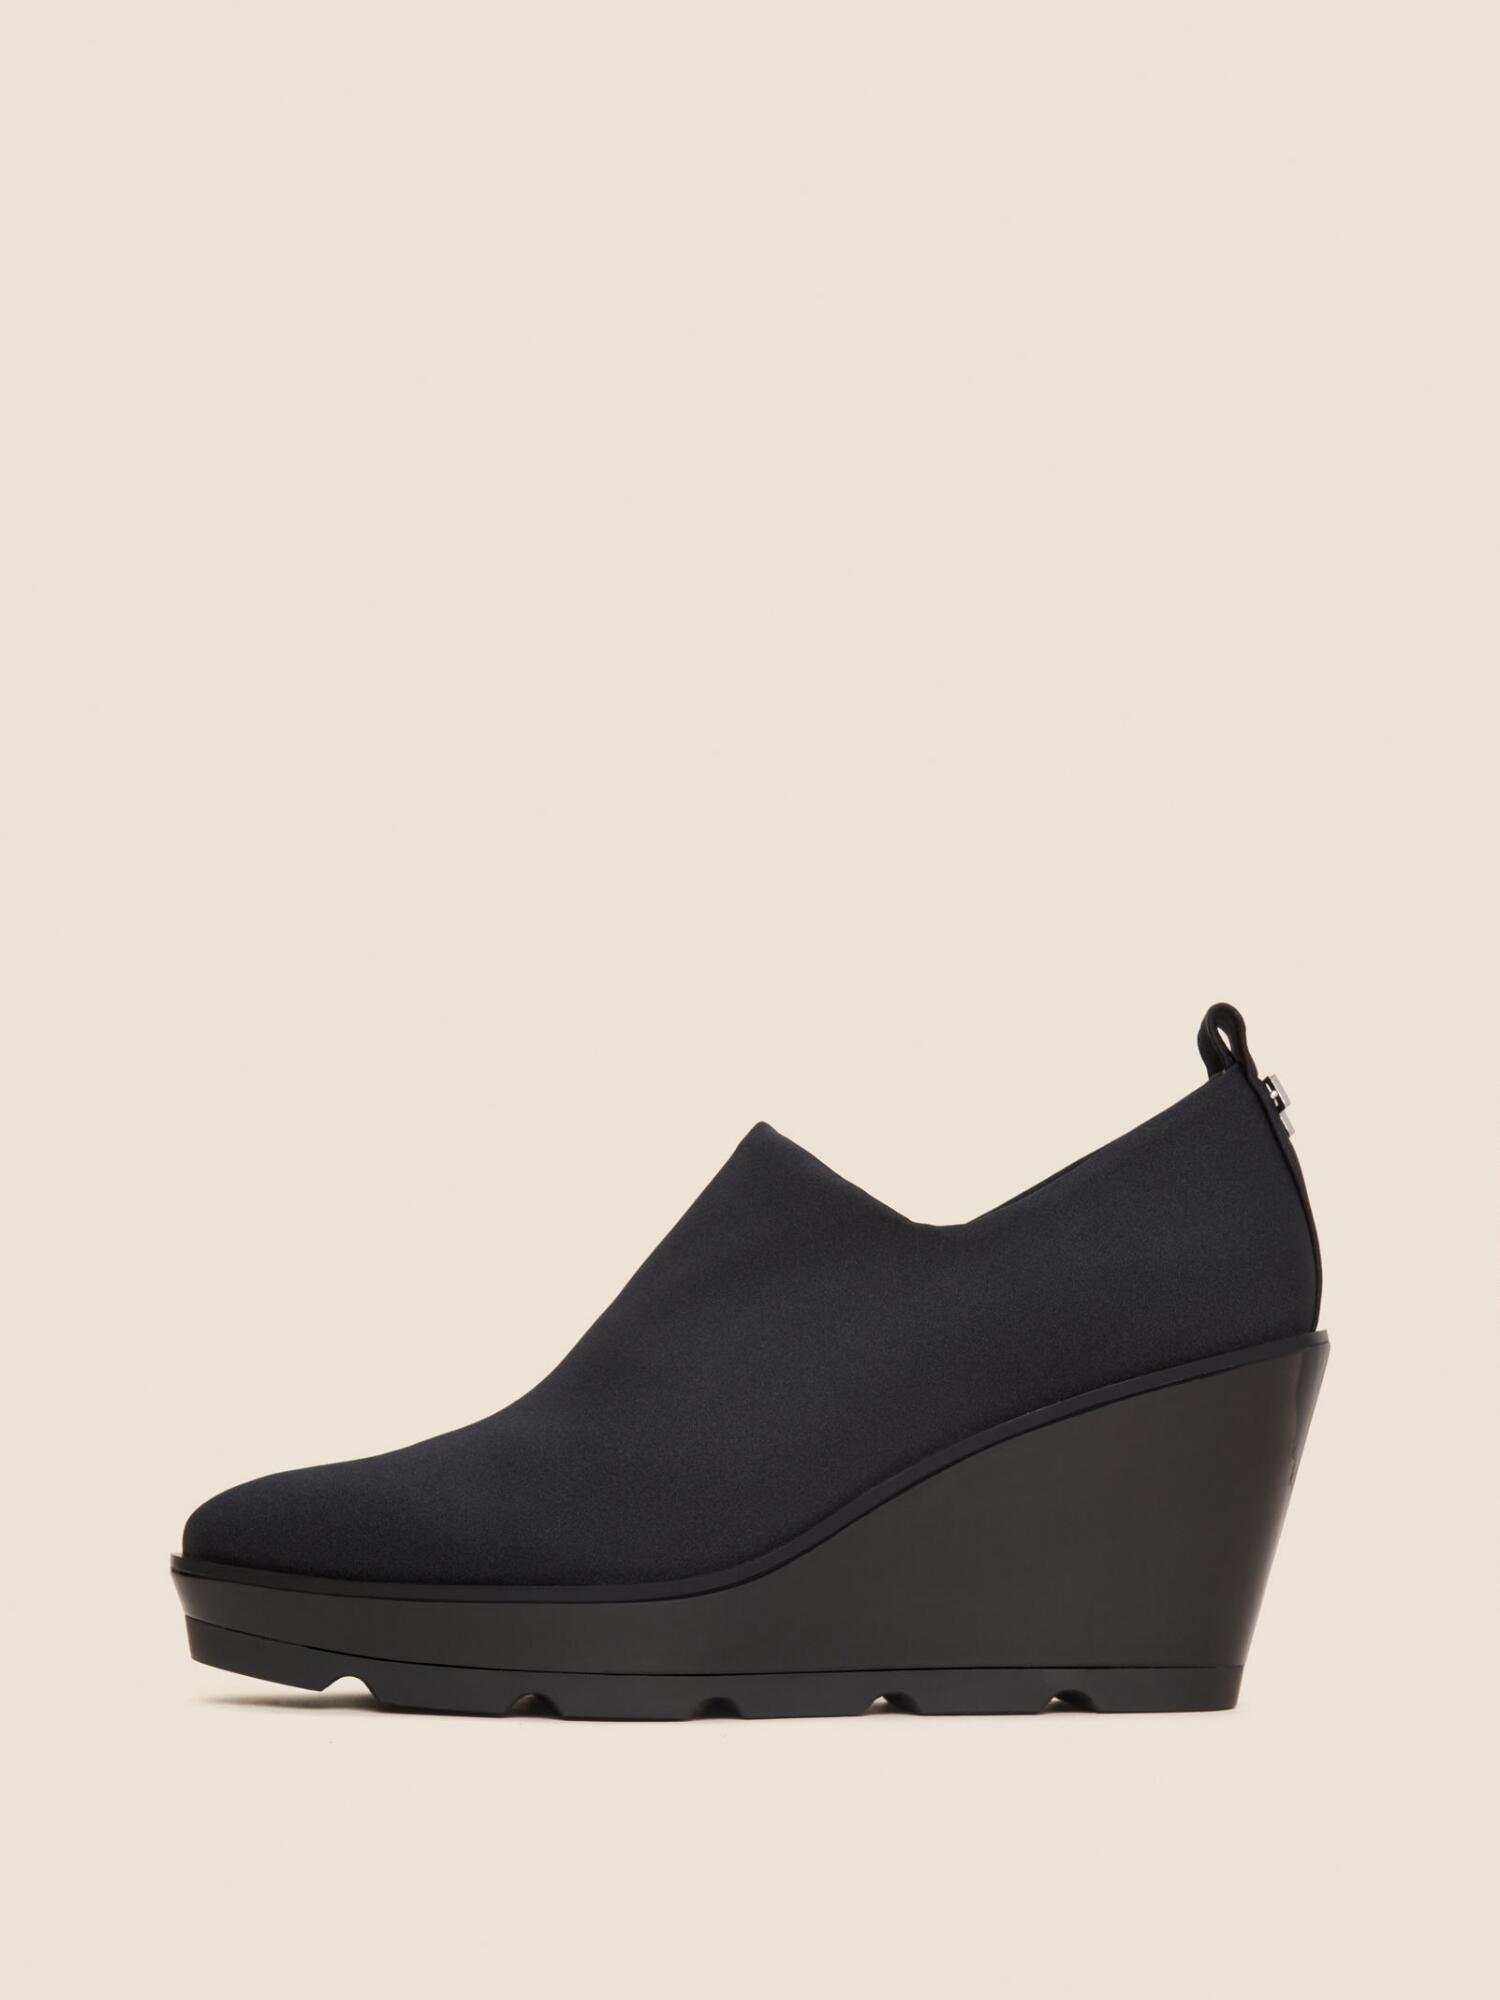 64e5661248c Donna Karan Zee Slip-On Wedge Sneaker In Black